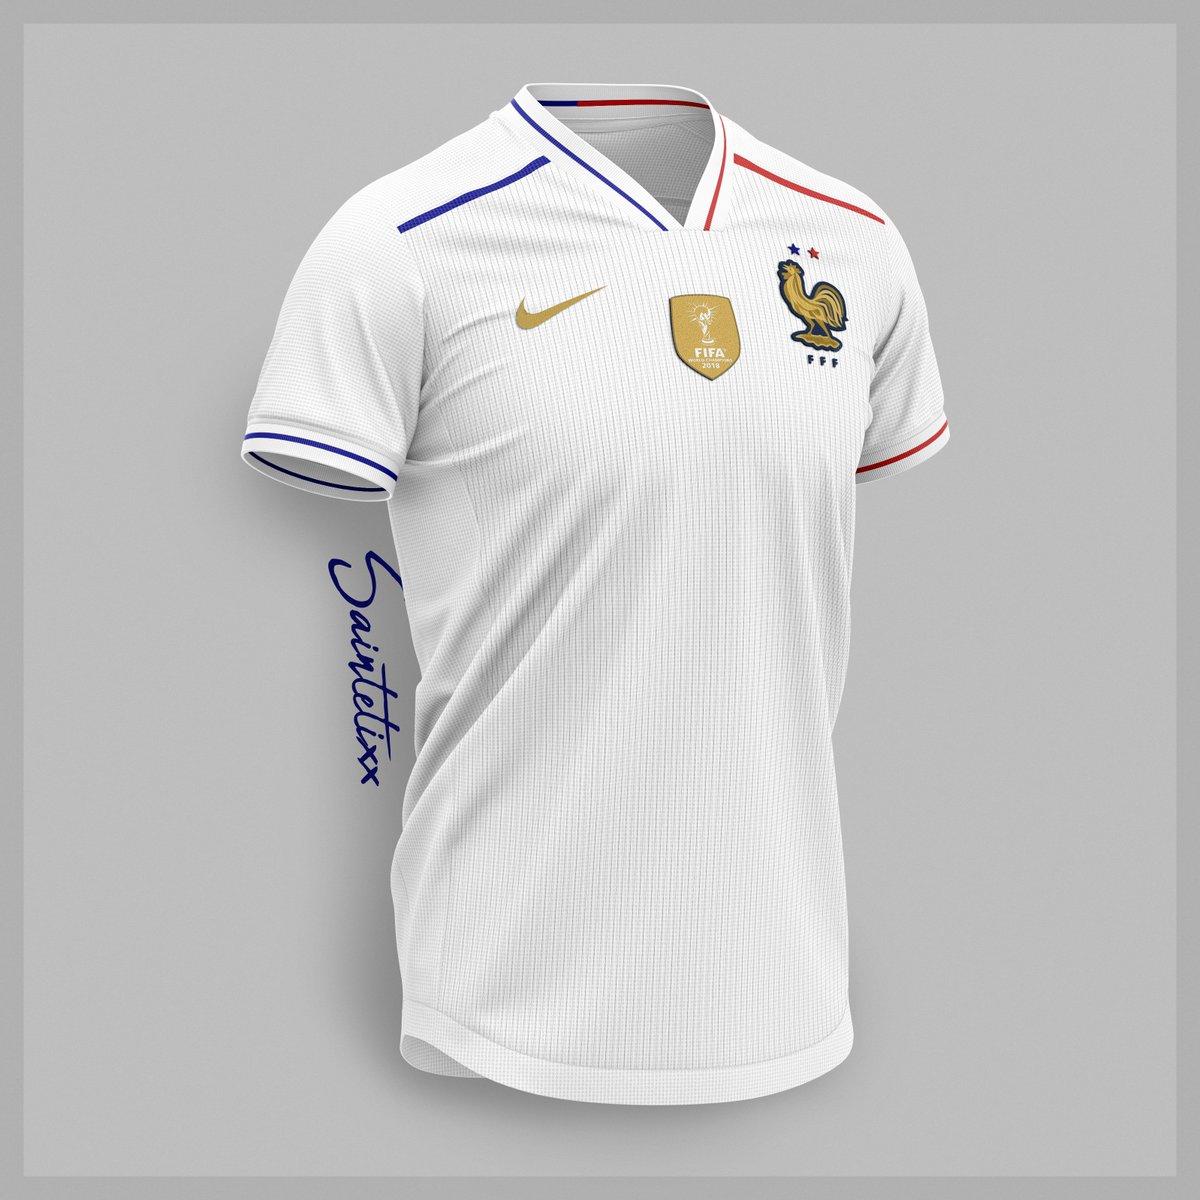 RT @Saintetixx: ▪️France Away x Nike concept . #France #2emeEtoile #ChampionsDuMonde https://t.co/91igFVzUsa